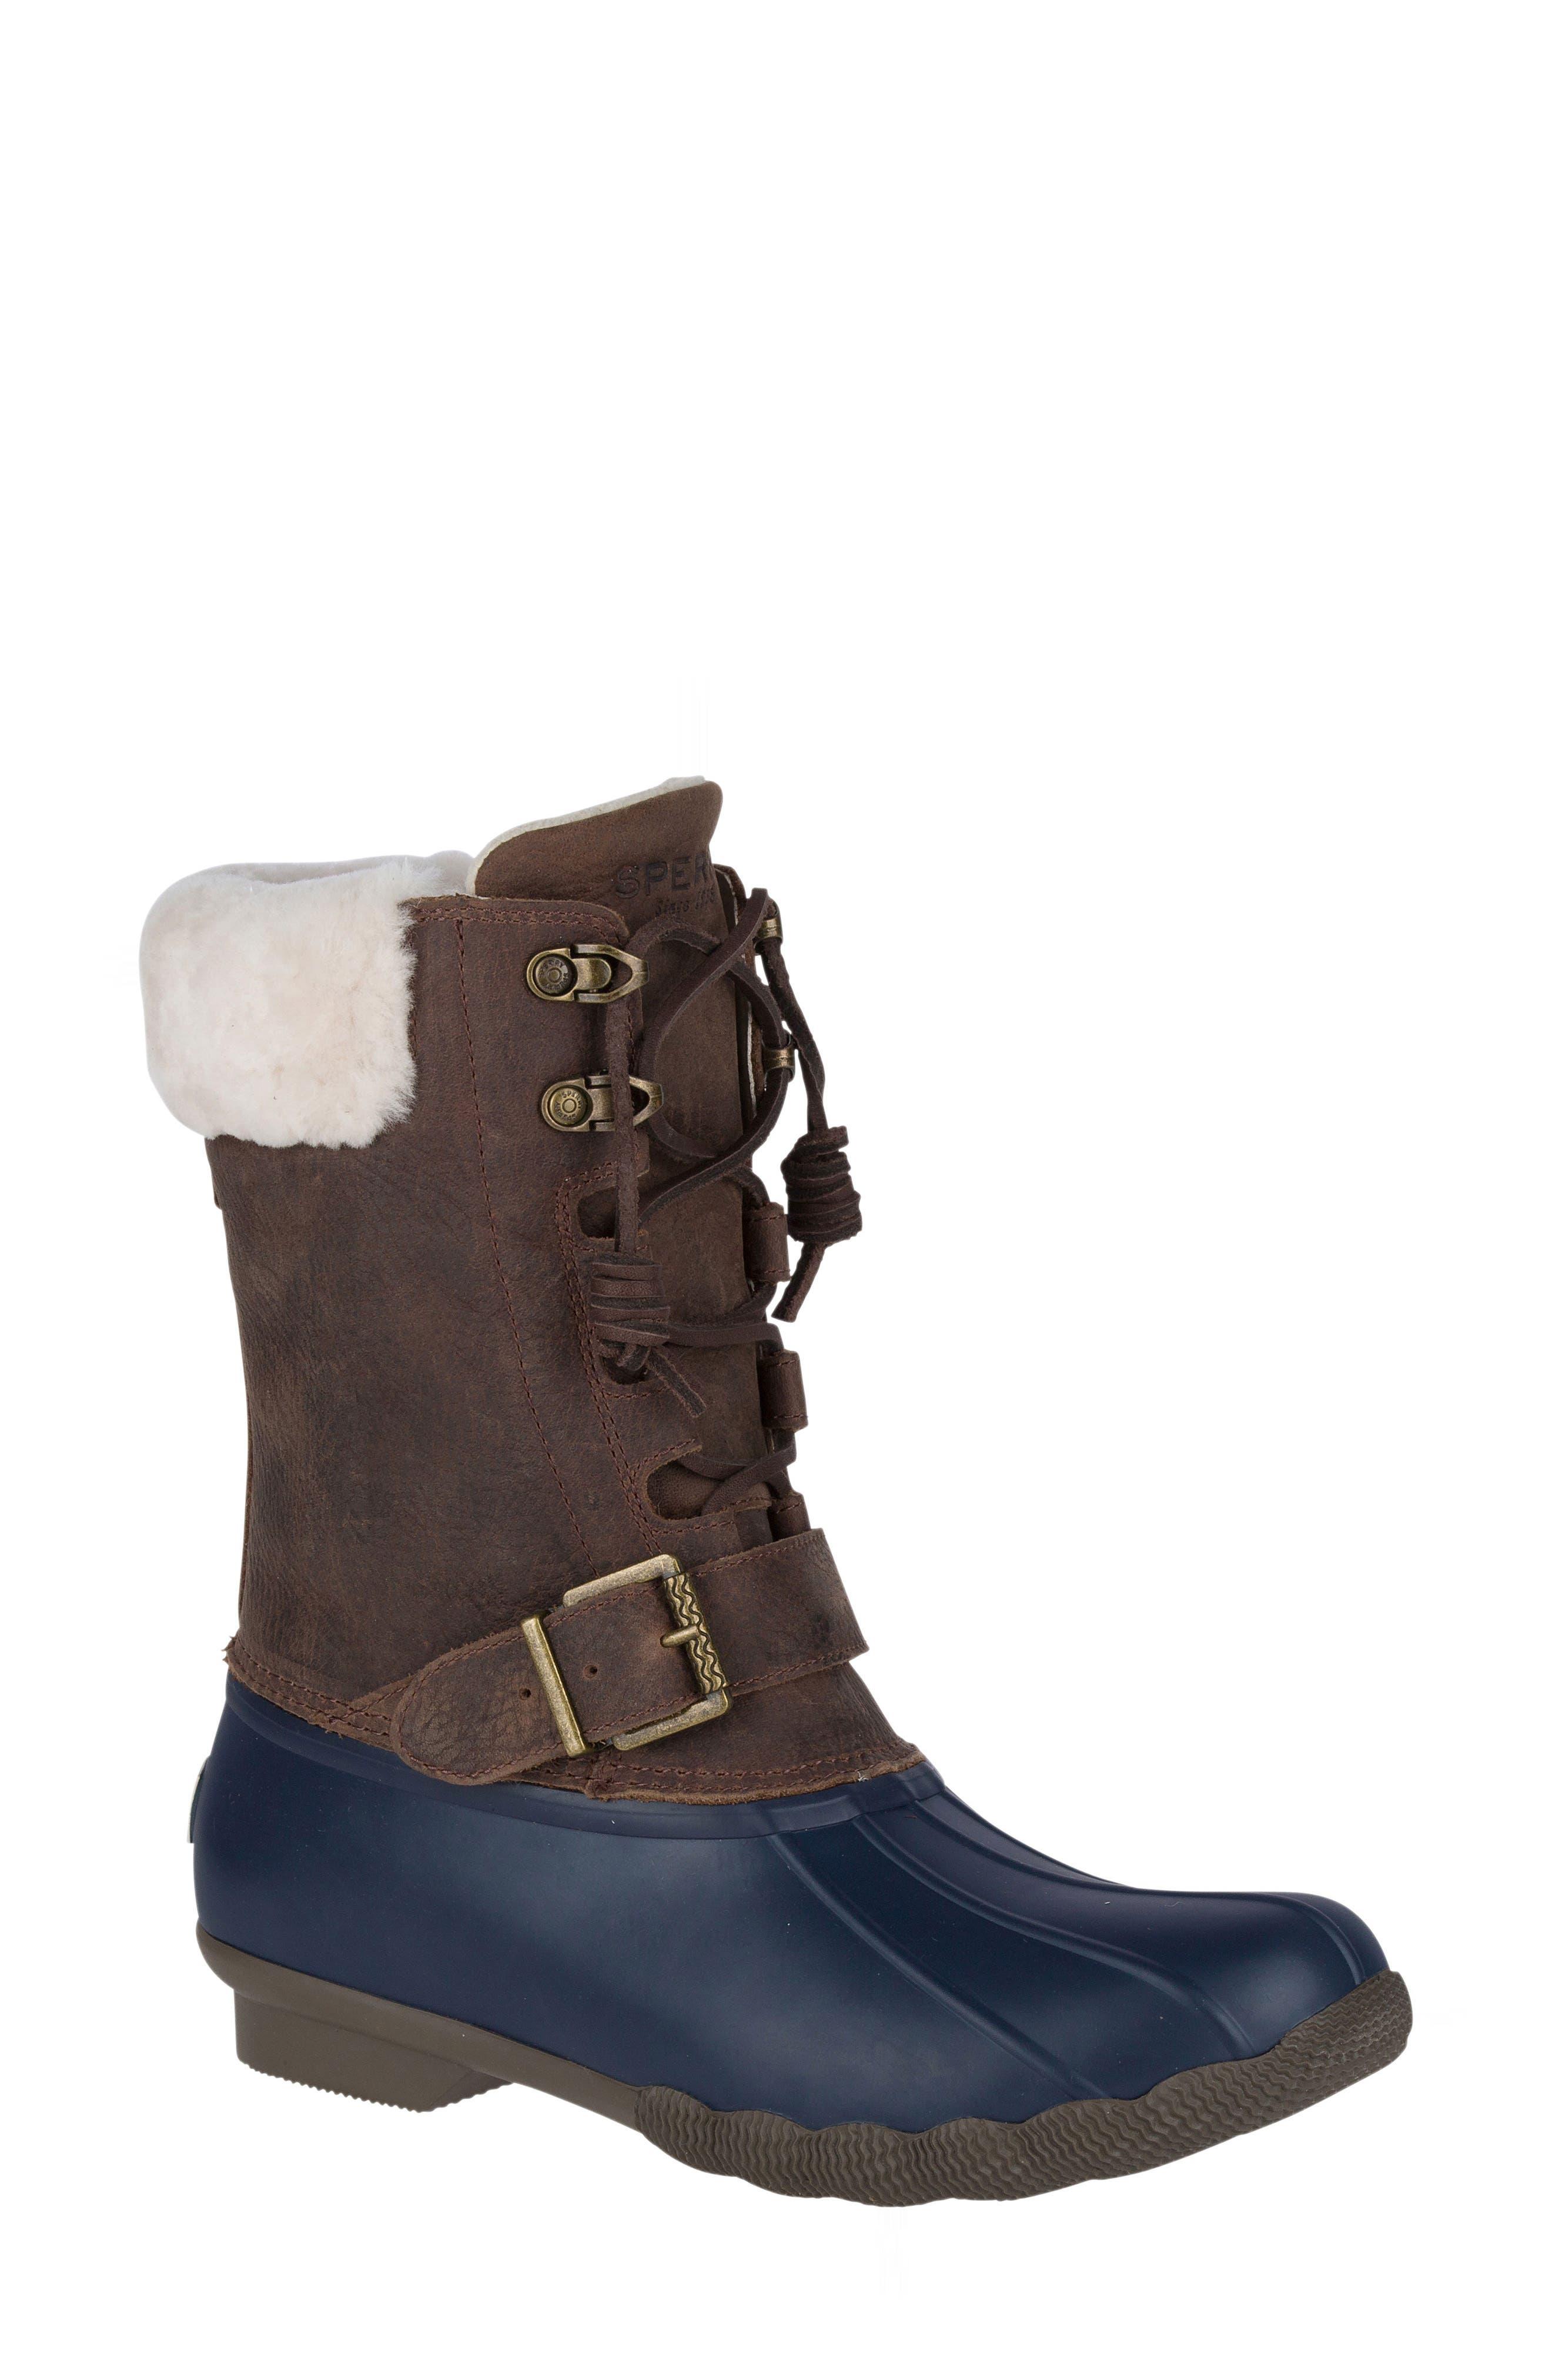 Alternate Image 1 Selected - Sperry Saltwater Misty Waterproof Rain Boot (Women)